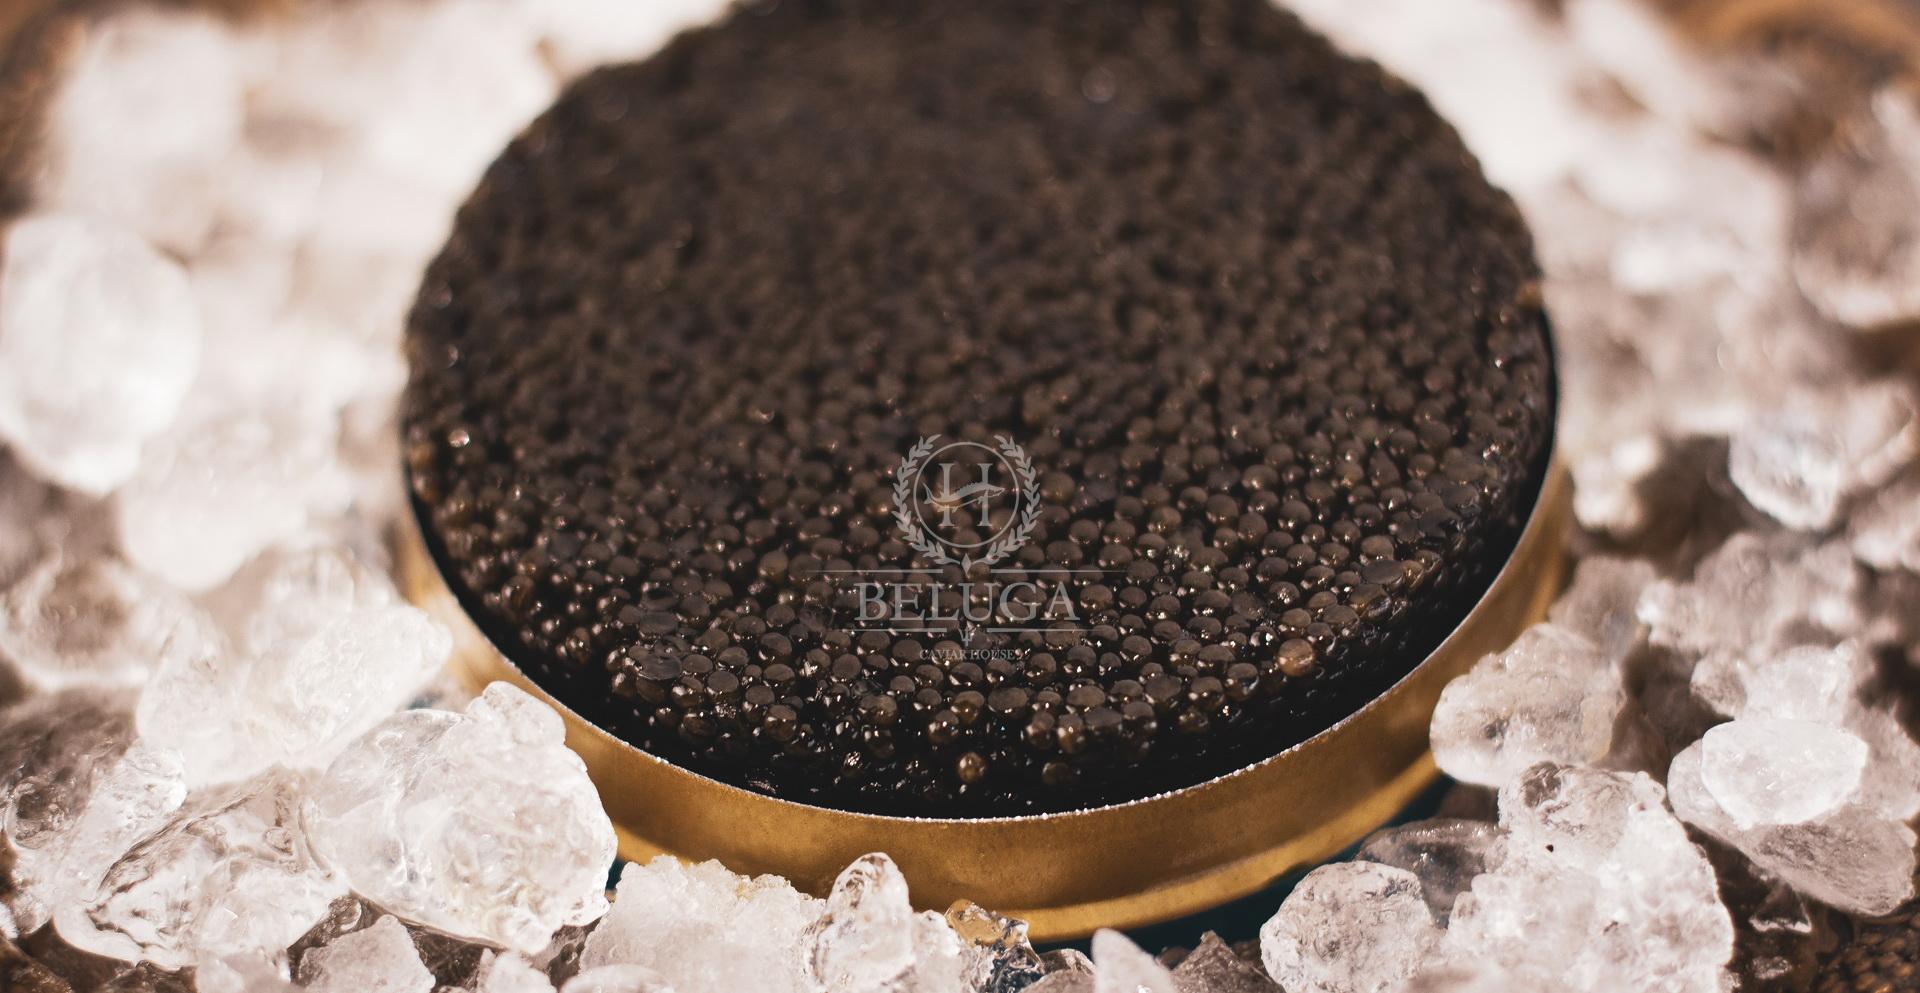 Black Beluga caviar